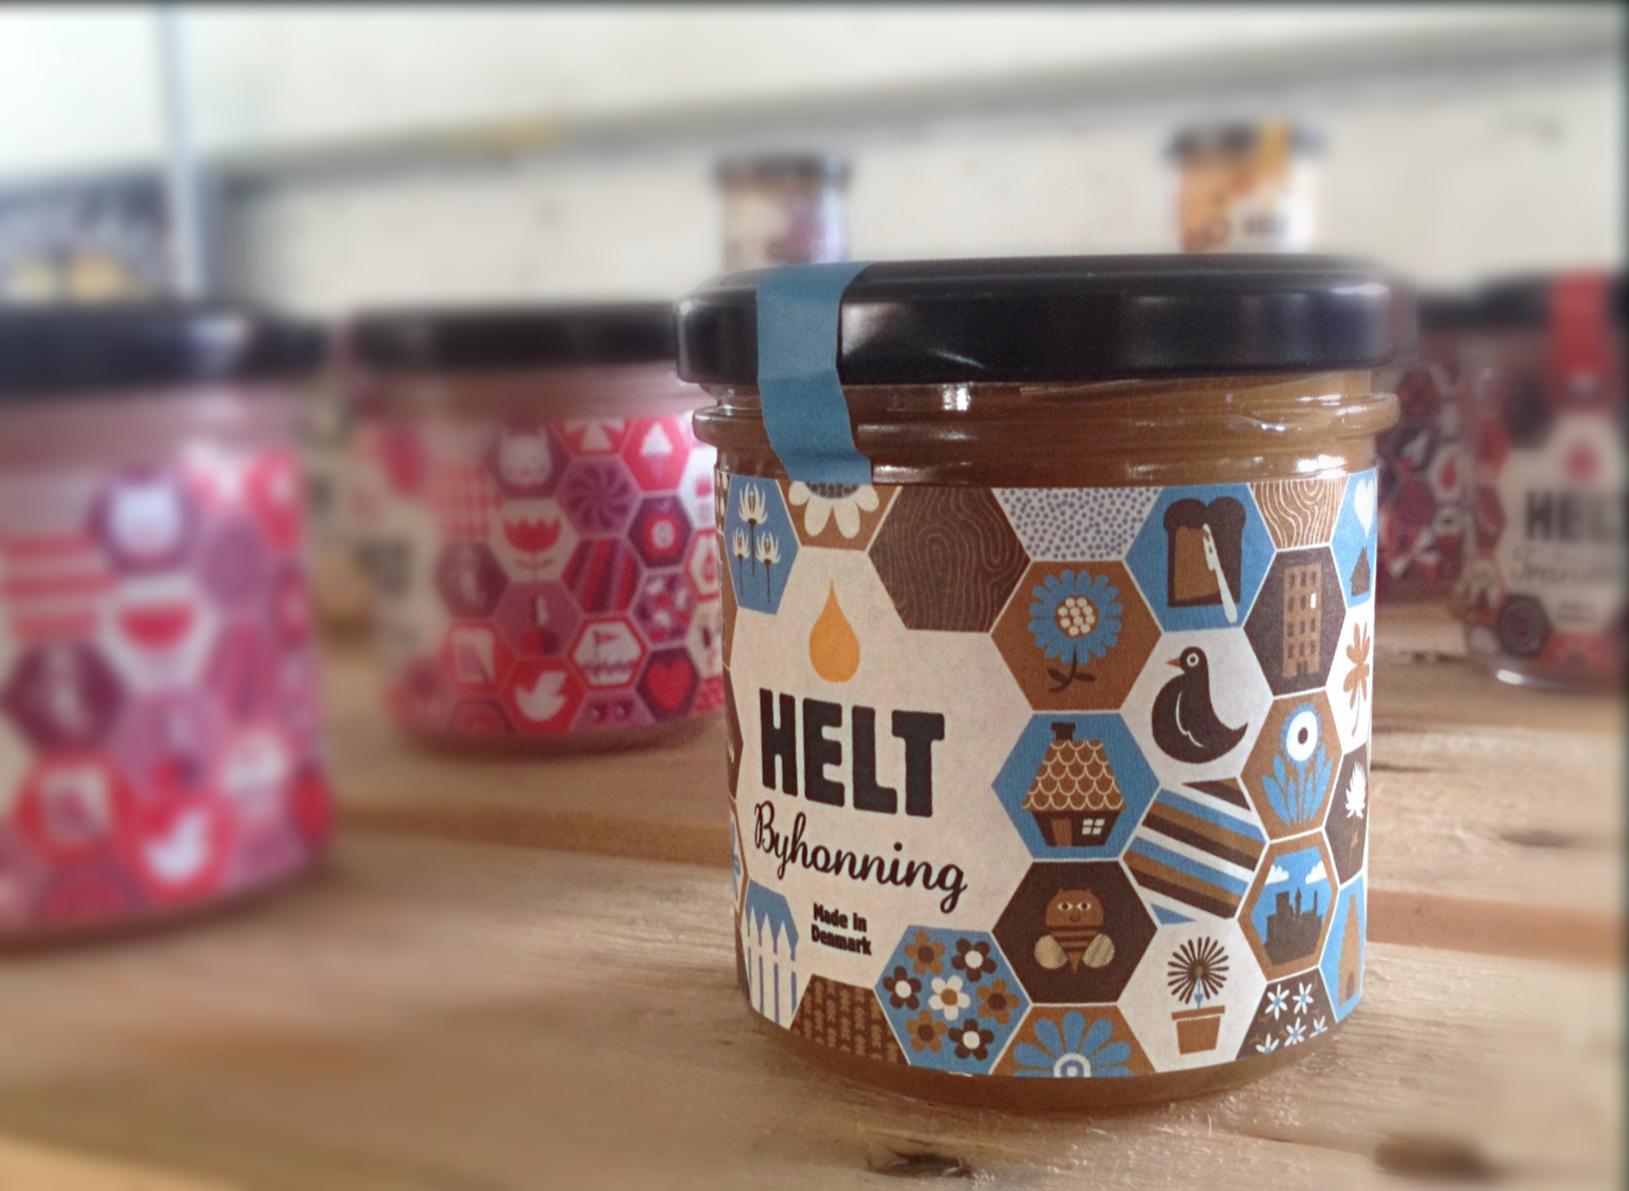 Helt_honning_packaging